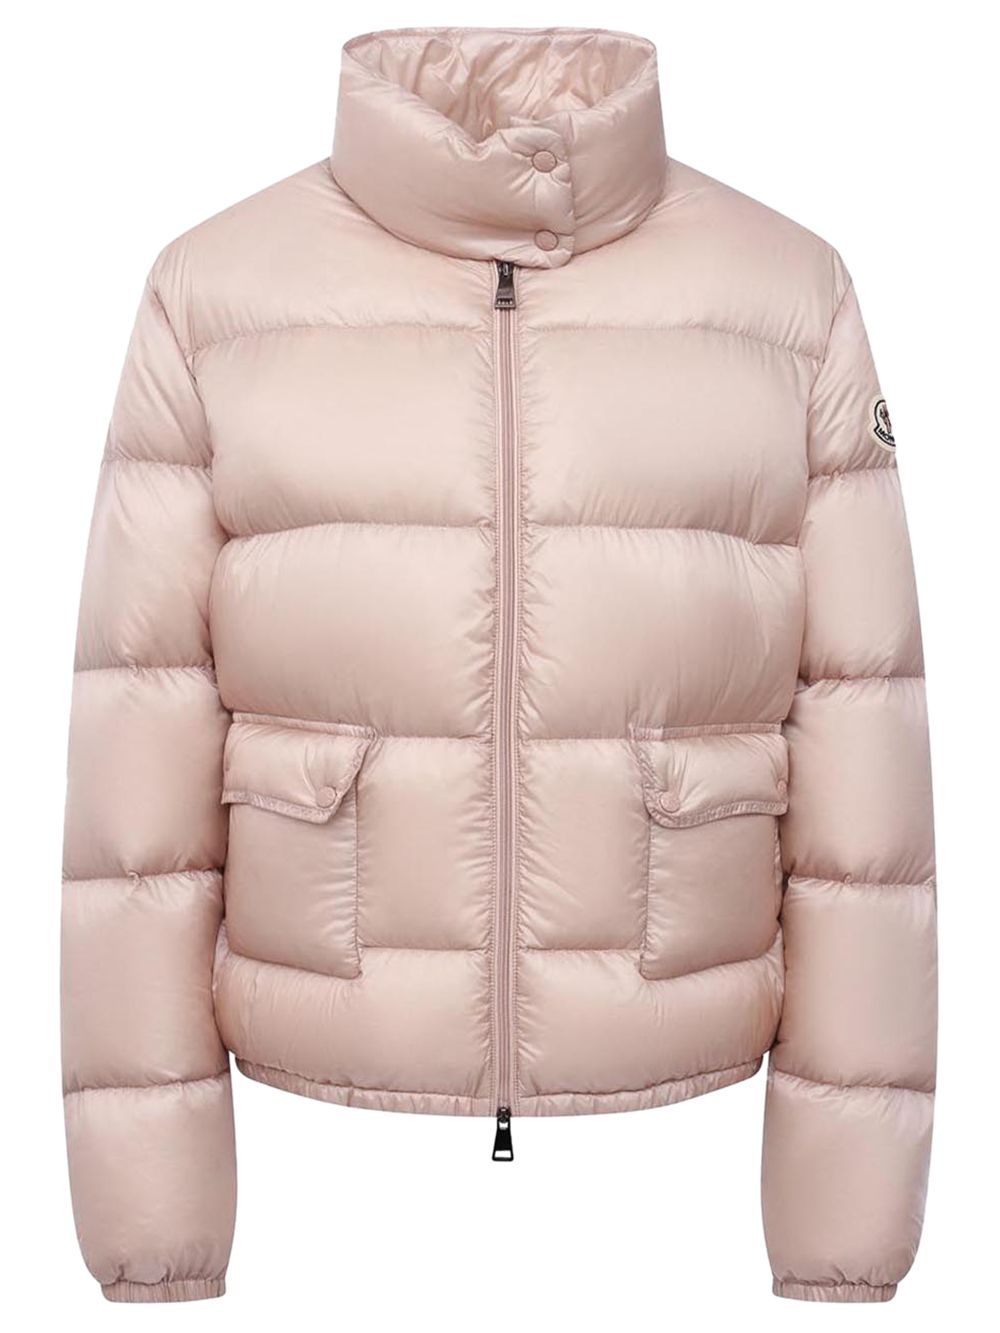 Lannic Puffer Jacket Light Pink